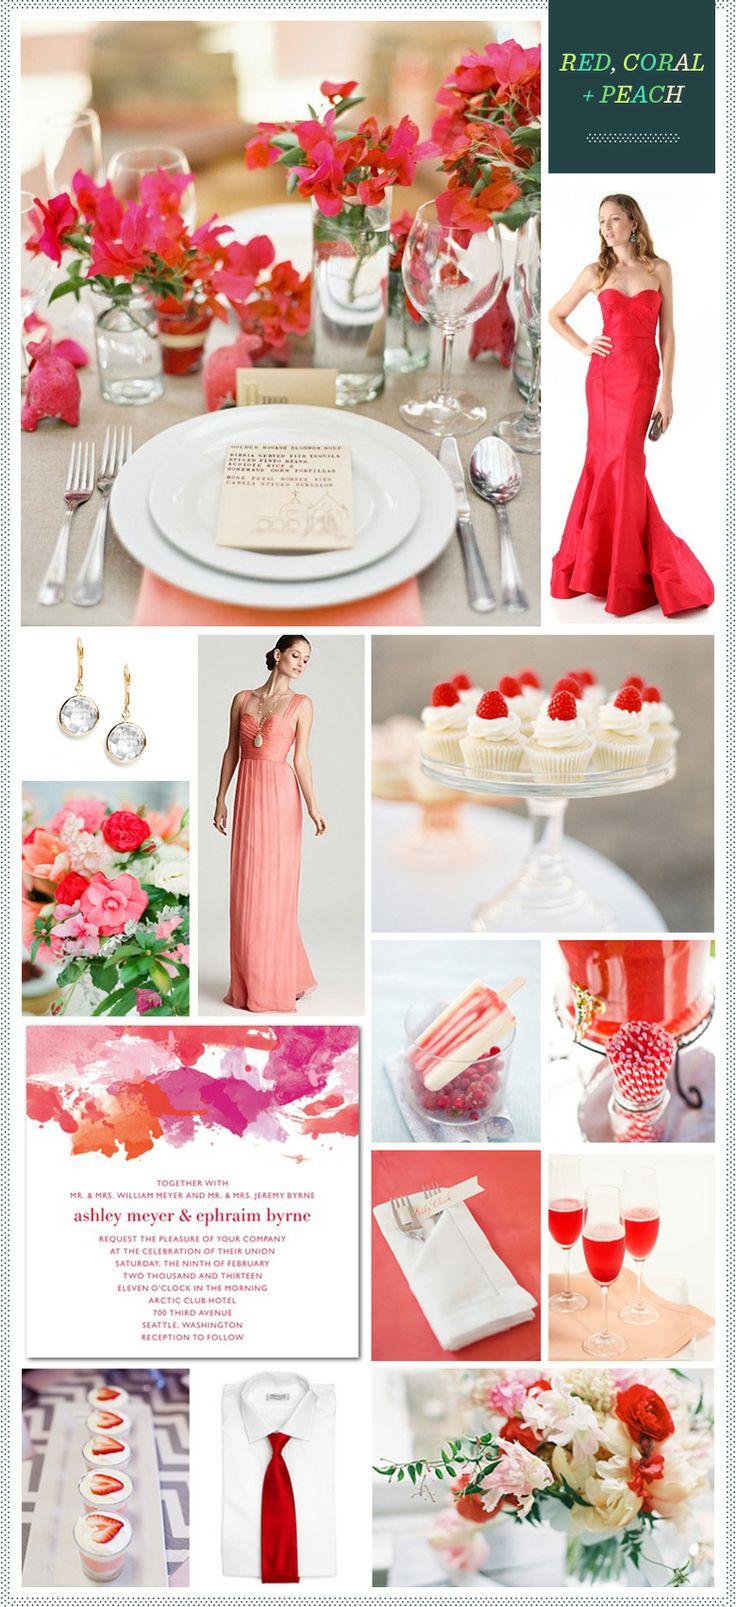 458 best Wedding @ Jellyfish images on Pinterest | Coral weddings ...